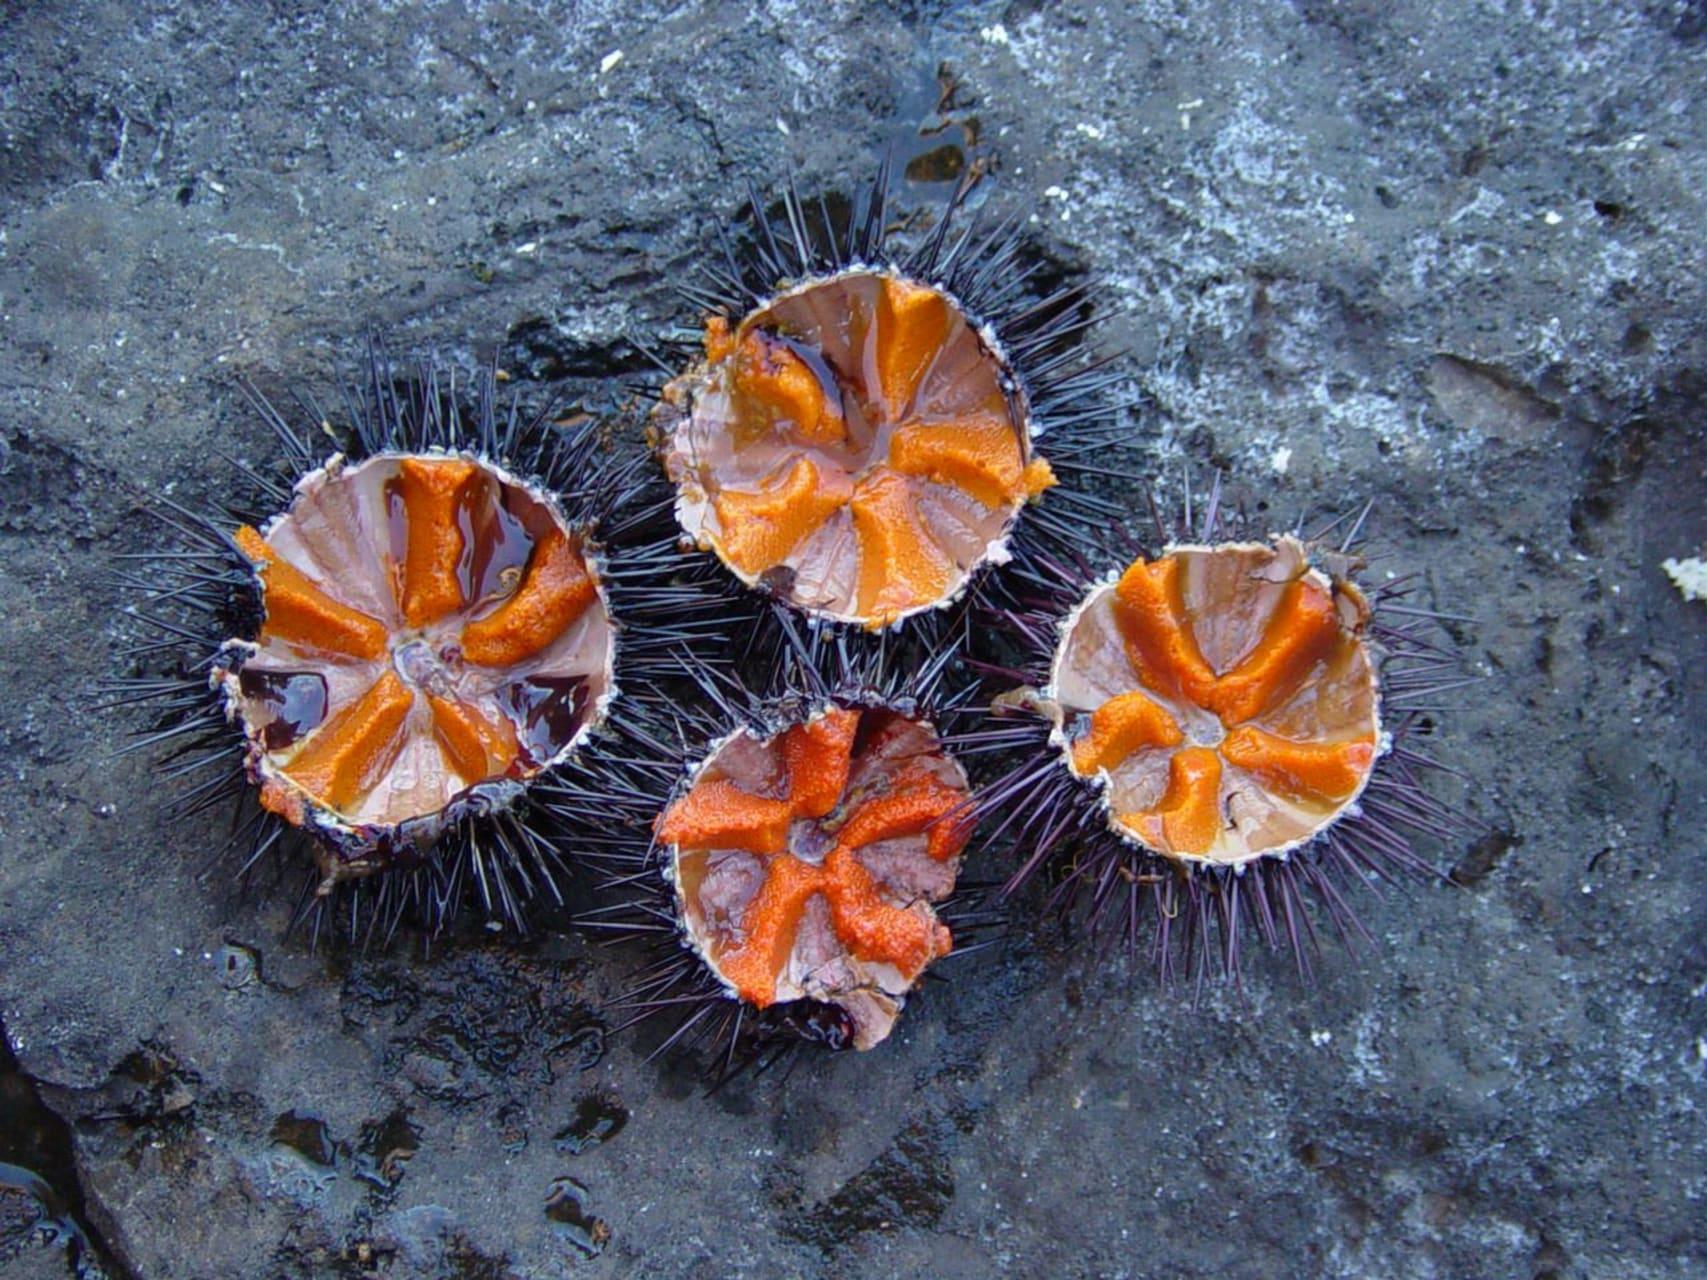 Korcula - Korcula - Sea Urchin - Aphrodisiac from the Adriatic